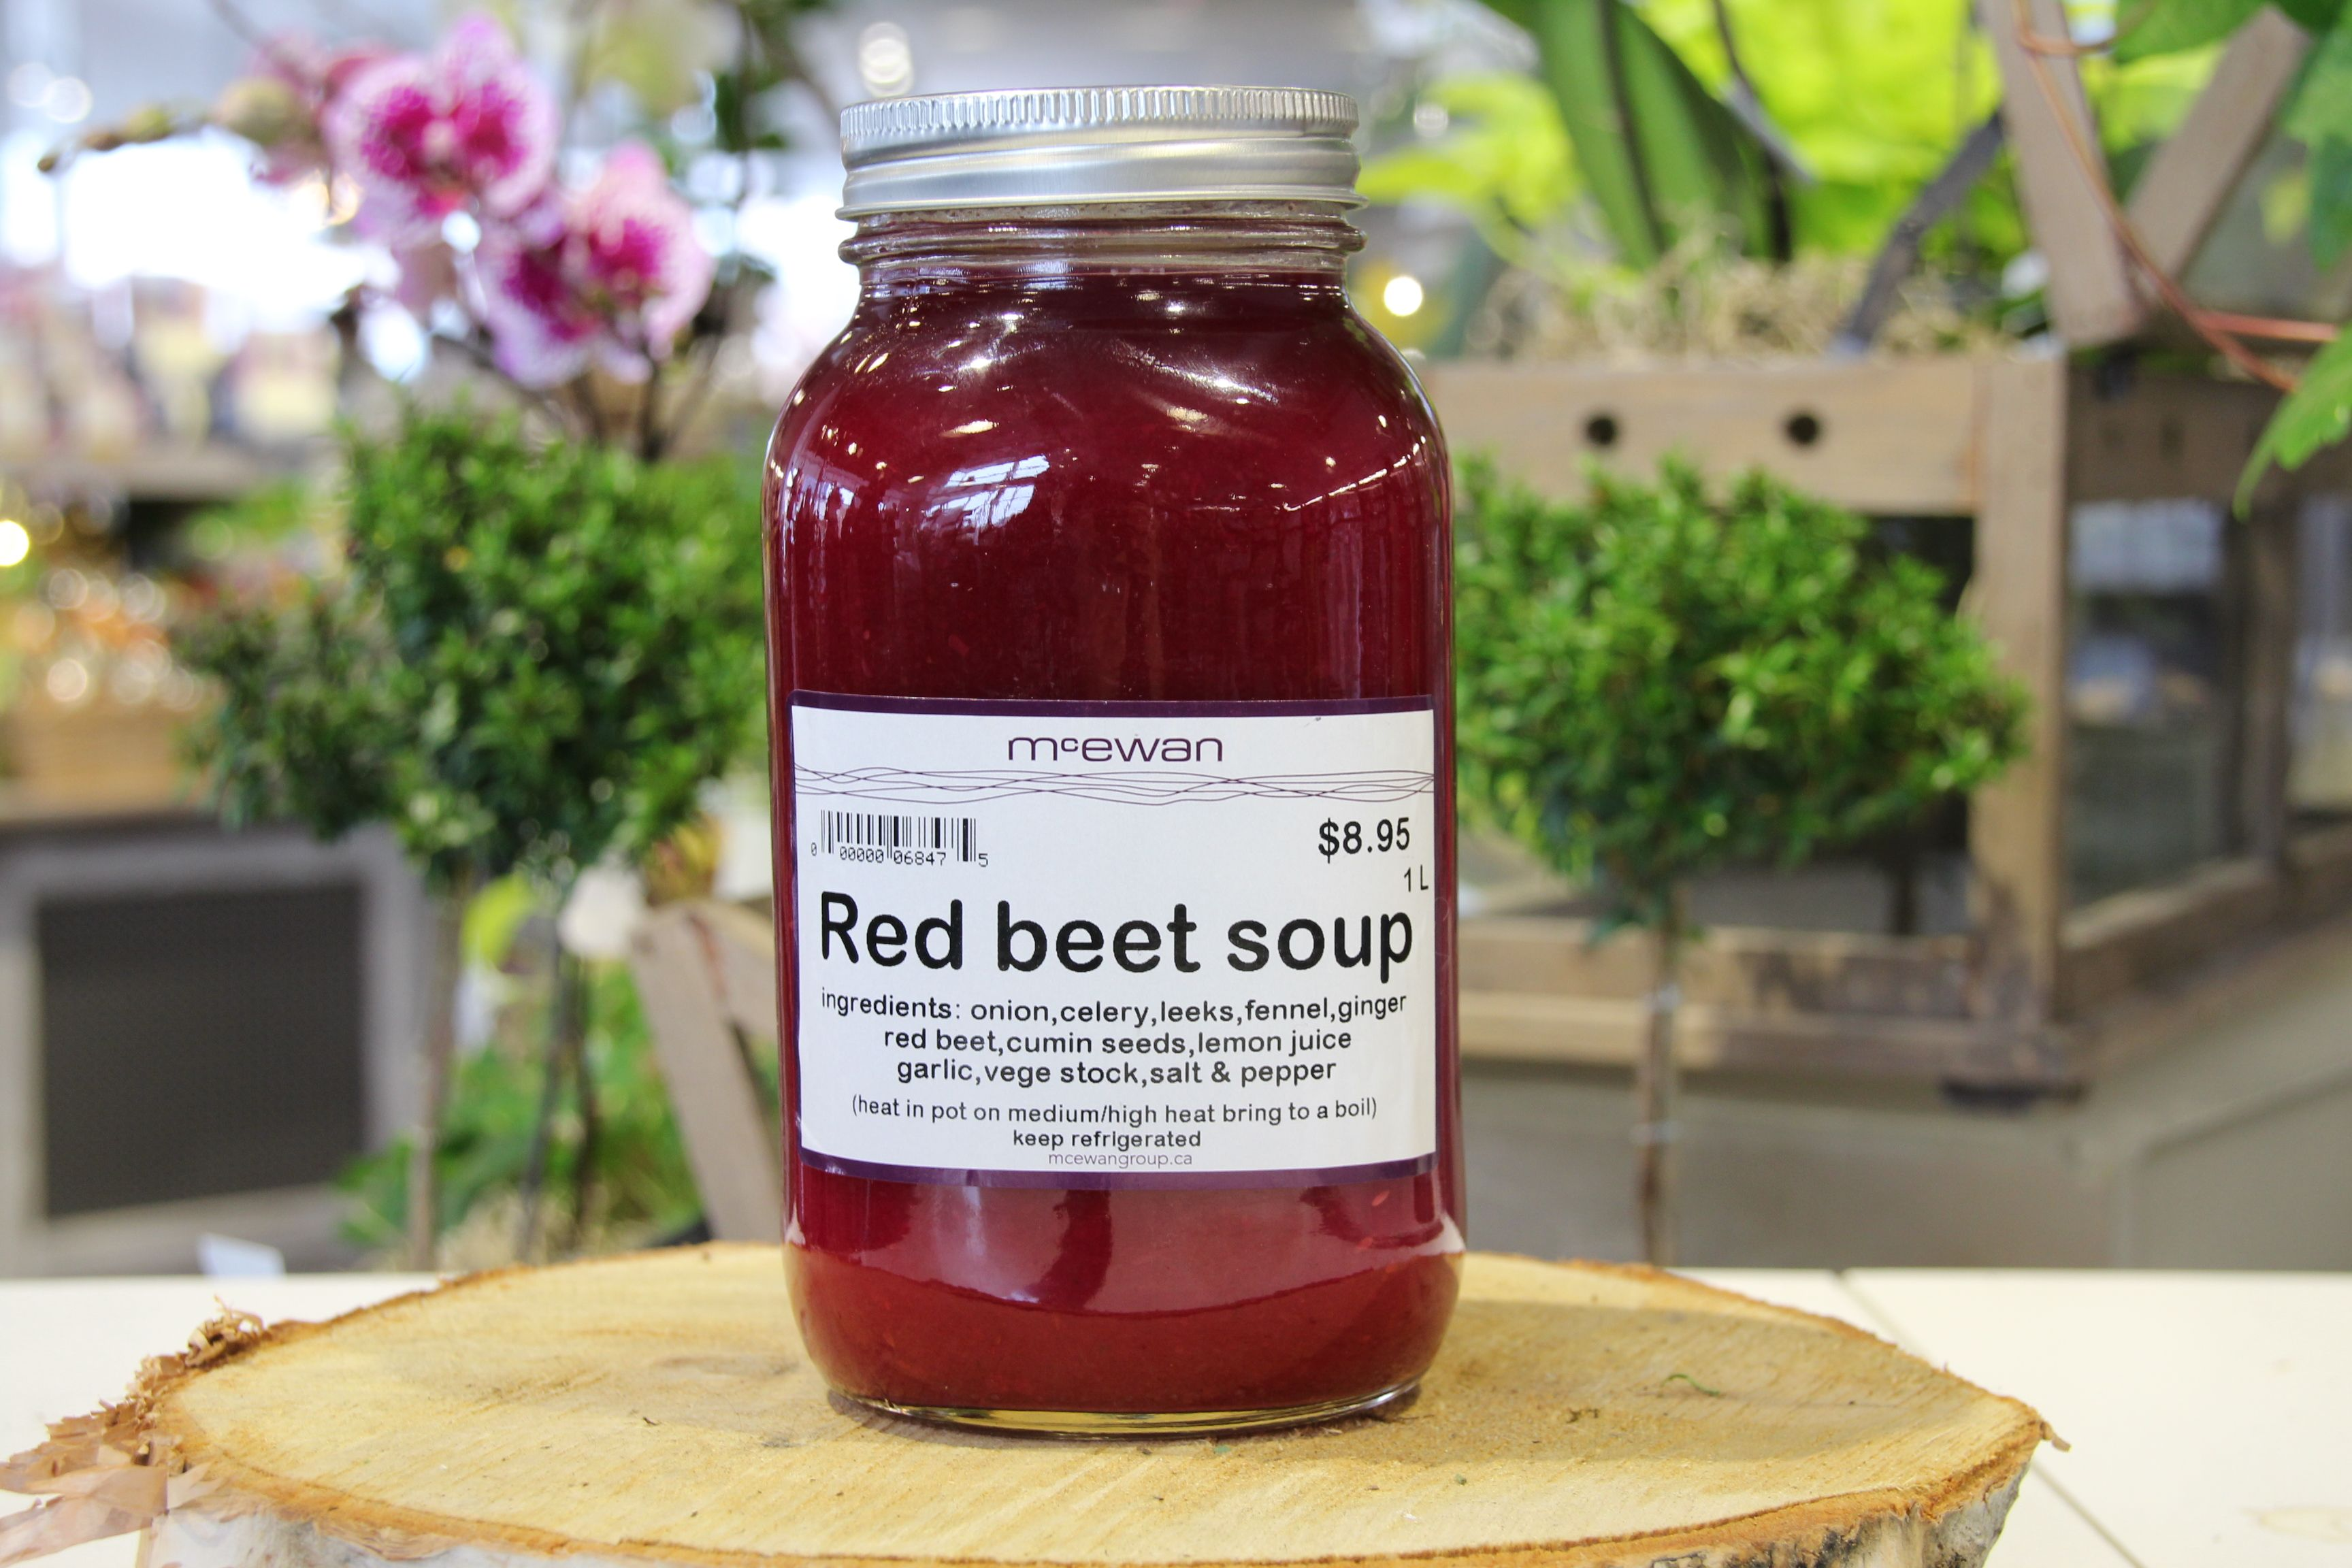 Red Beet Soup #McEwansOwn